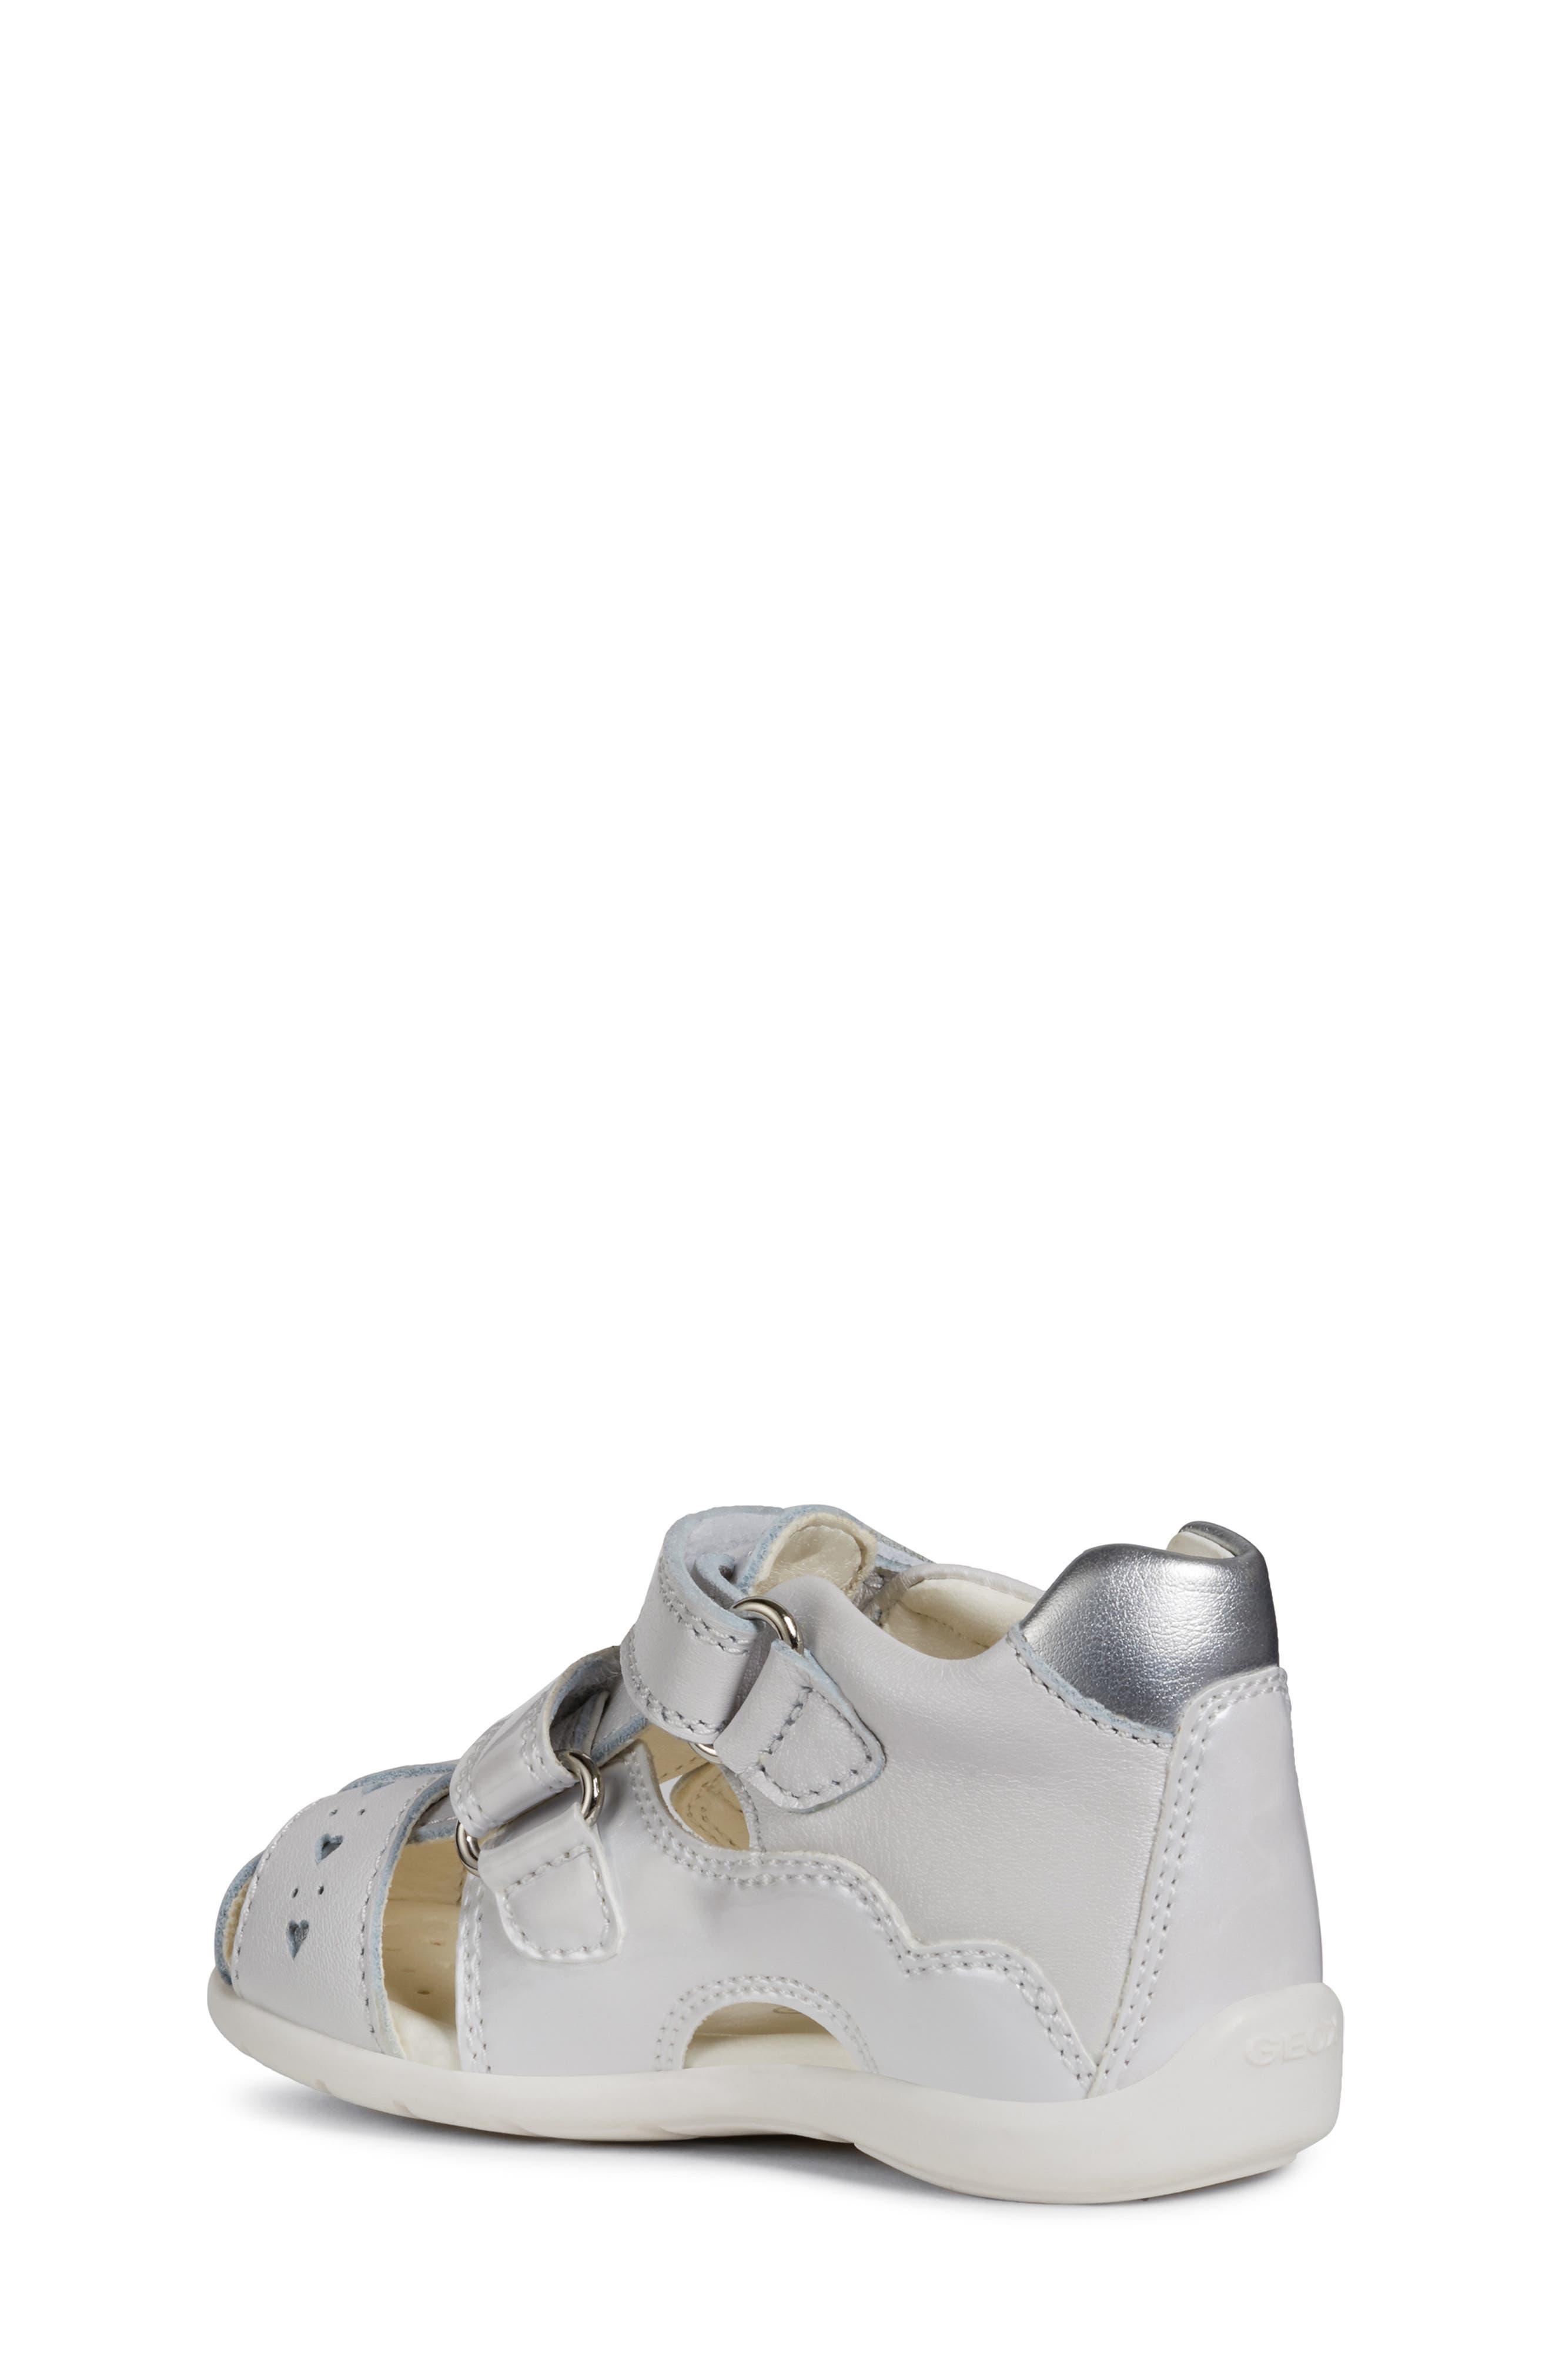 GEOX,                             Kaytan 52 Shimmery Sandal,                             Alternate thumbnail 2, color,                             WHITE/ SILVER